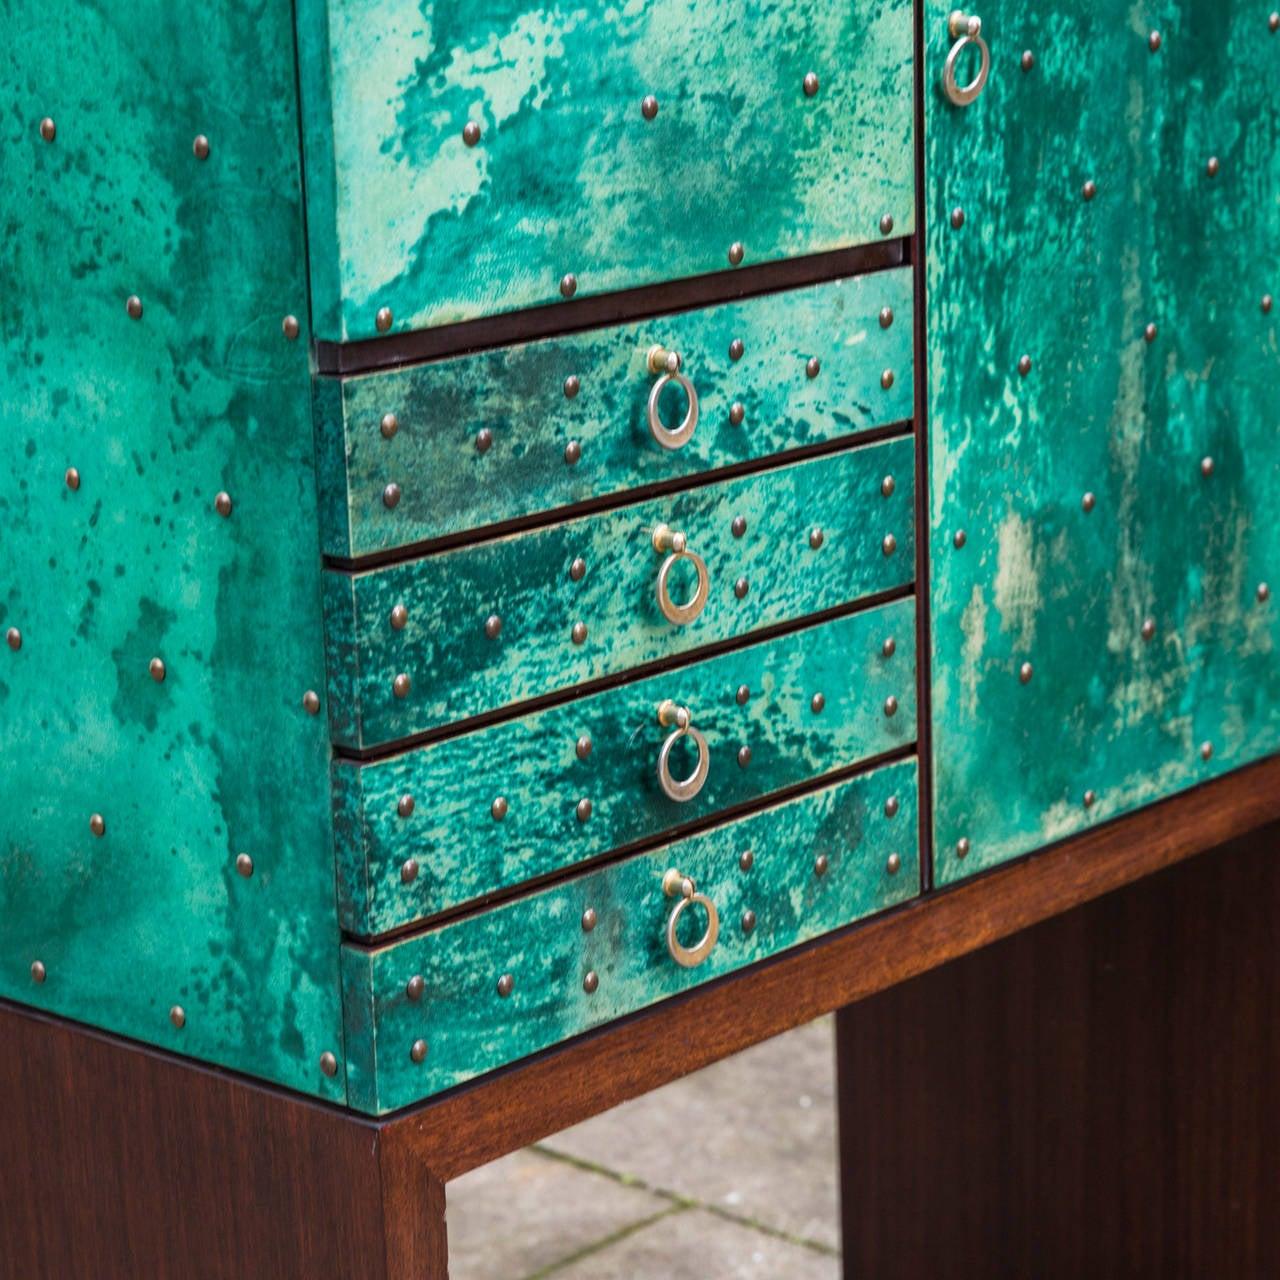 Magnificent Turquoise Goatskin Aldo Tura Bar Cabinet at 1stdibs